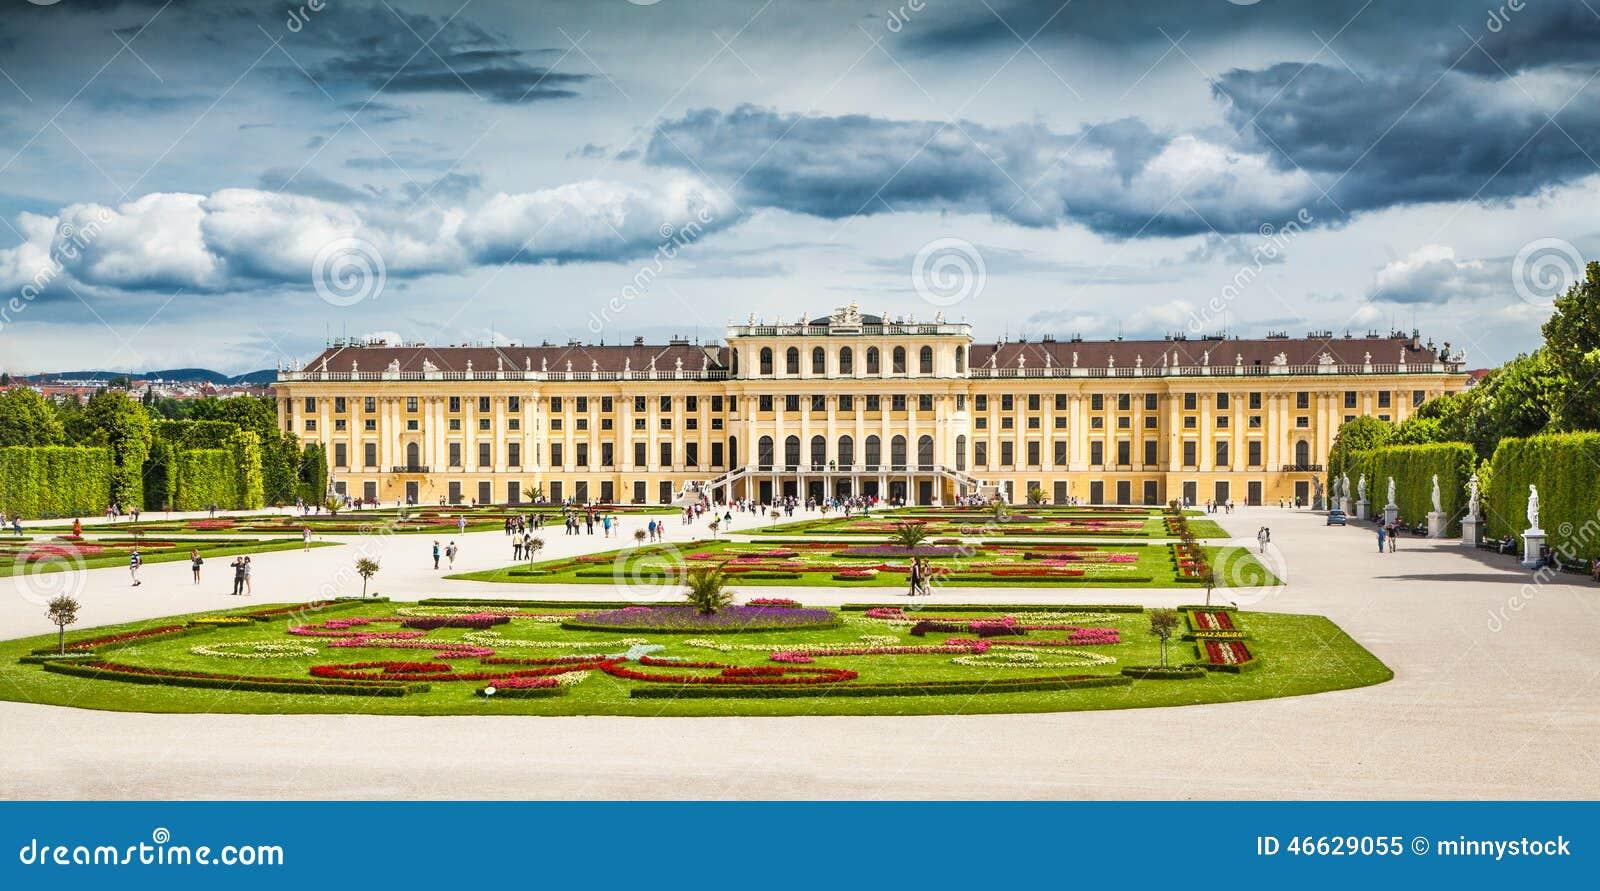 Palácio de Schonbrunn em Viena, Áustria